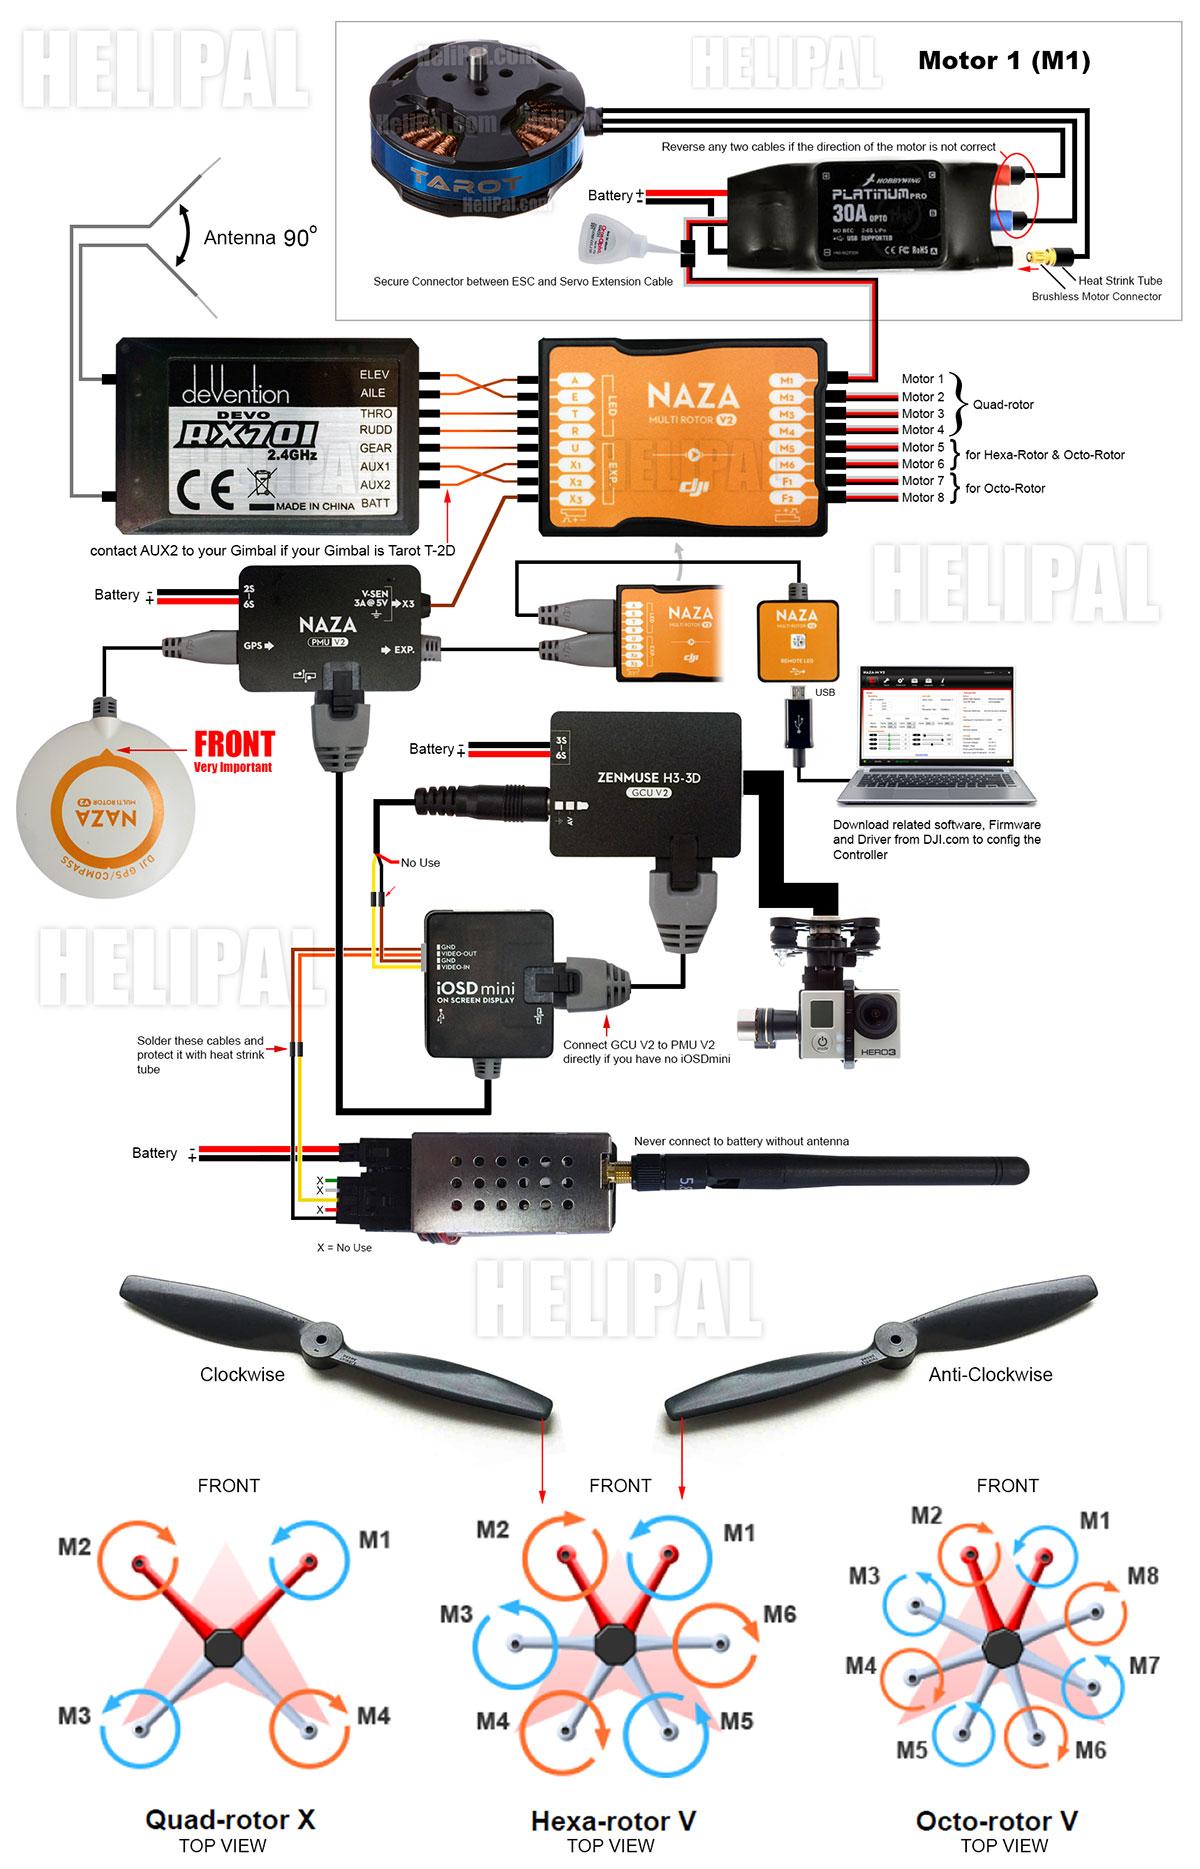 DF_1268] Naza M Lite Wiring Diagram Download DiagramBoapu Phae Xaem Diog Push Xempag Tixat Mohammedshrine Librar Wiring 101